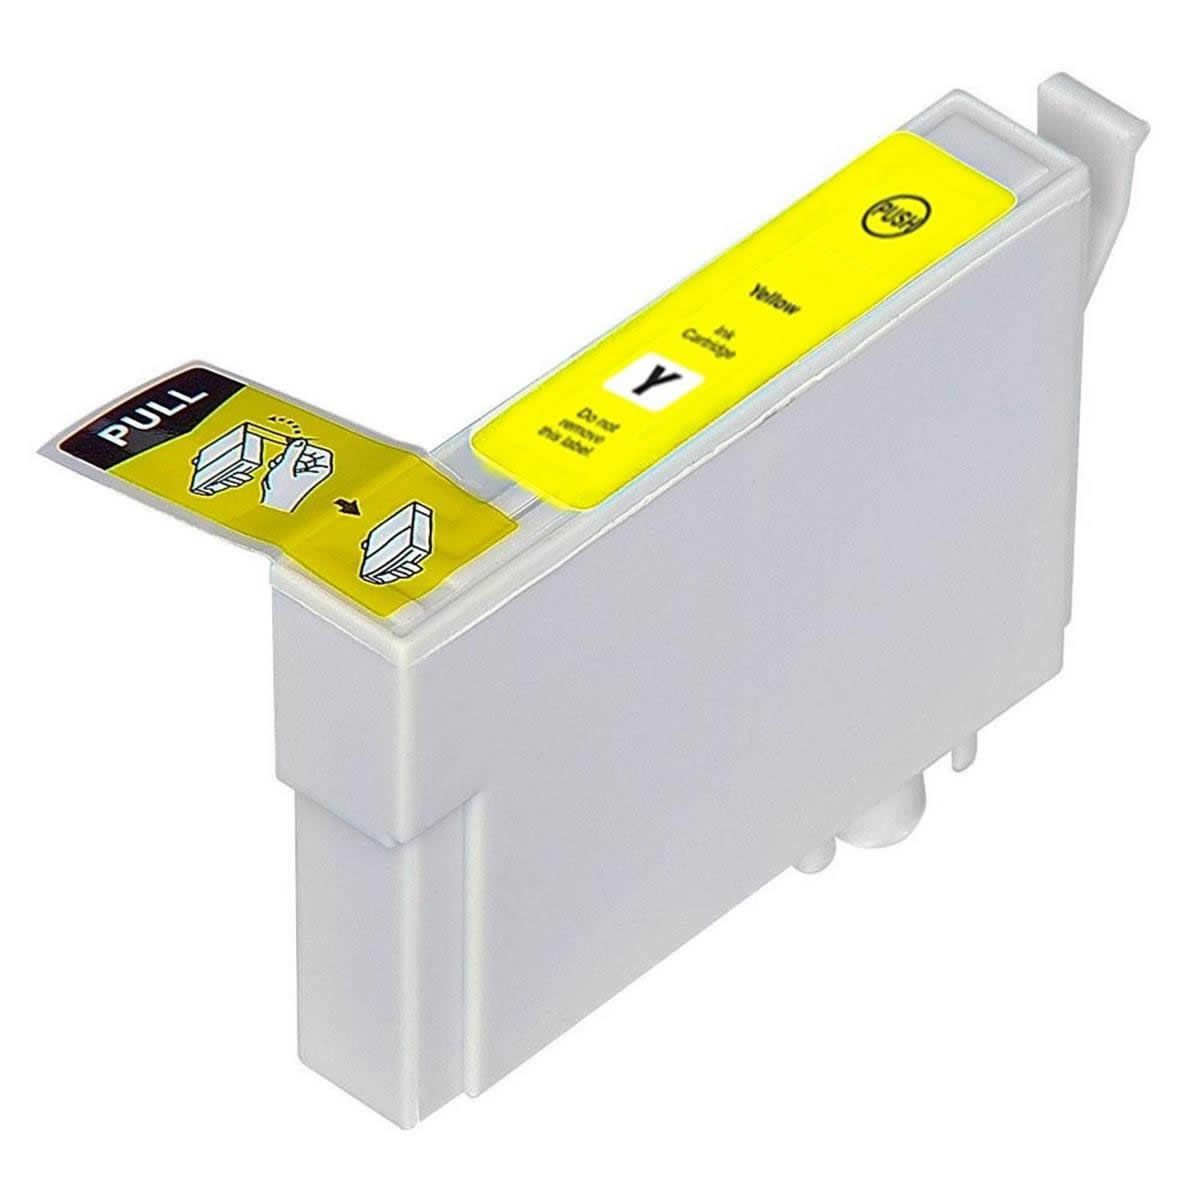 Cartucho TO484 Amarelo Compatível para Epson R200 R220 R300 R320 R340 R500 R600 RX500 RX600 RX620 RX640